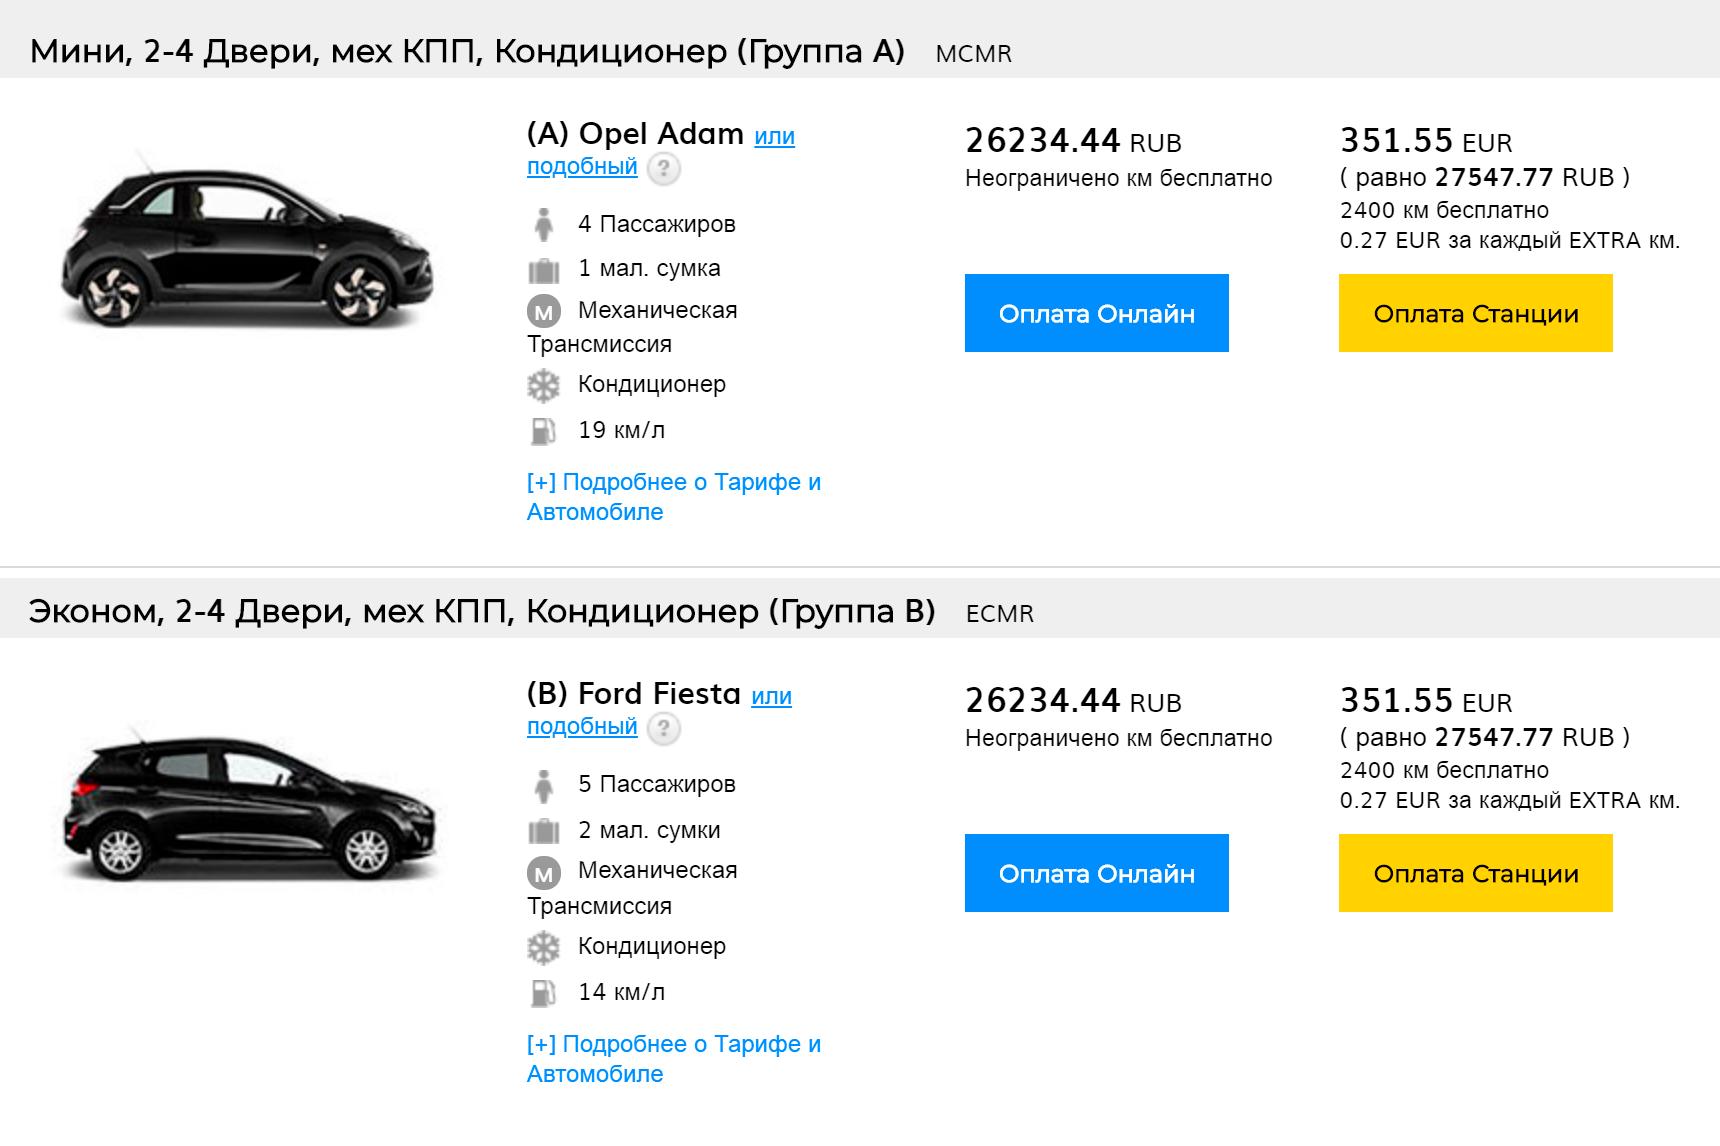 Авто того&nbsp;же класса напрямую у прокатчика — на 16€ (1284<span class=ruble>Р</span>) дороже